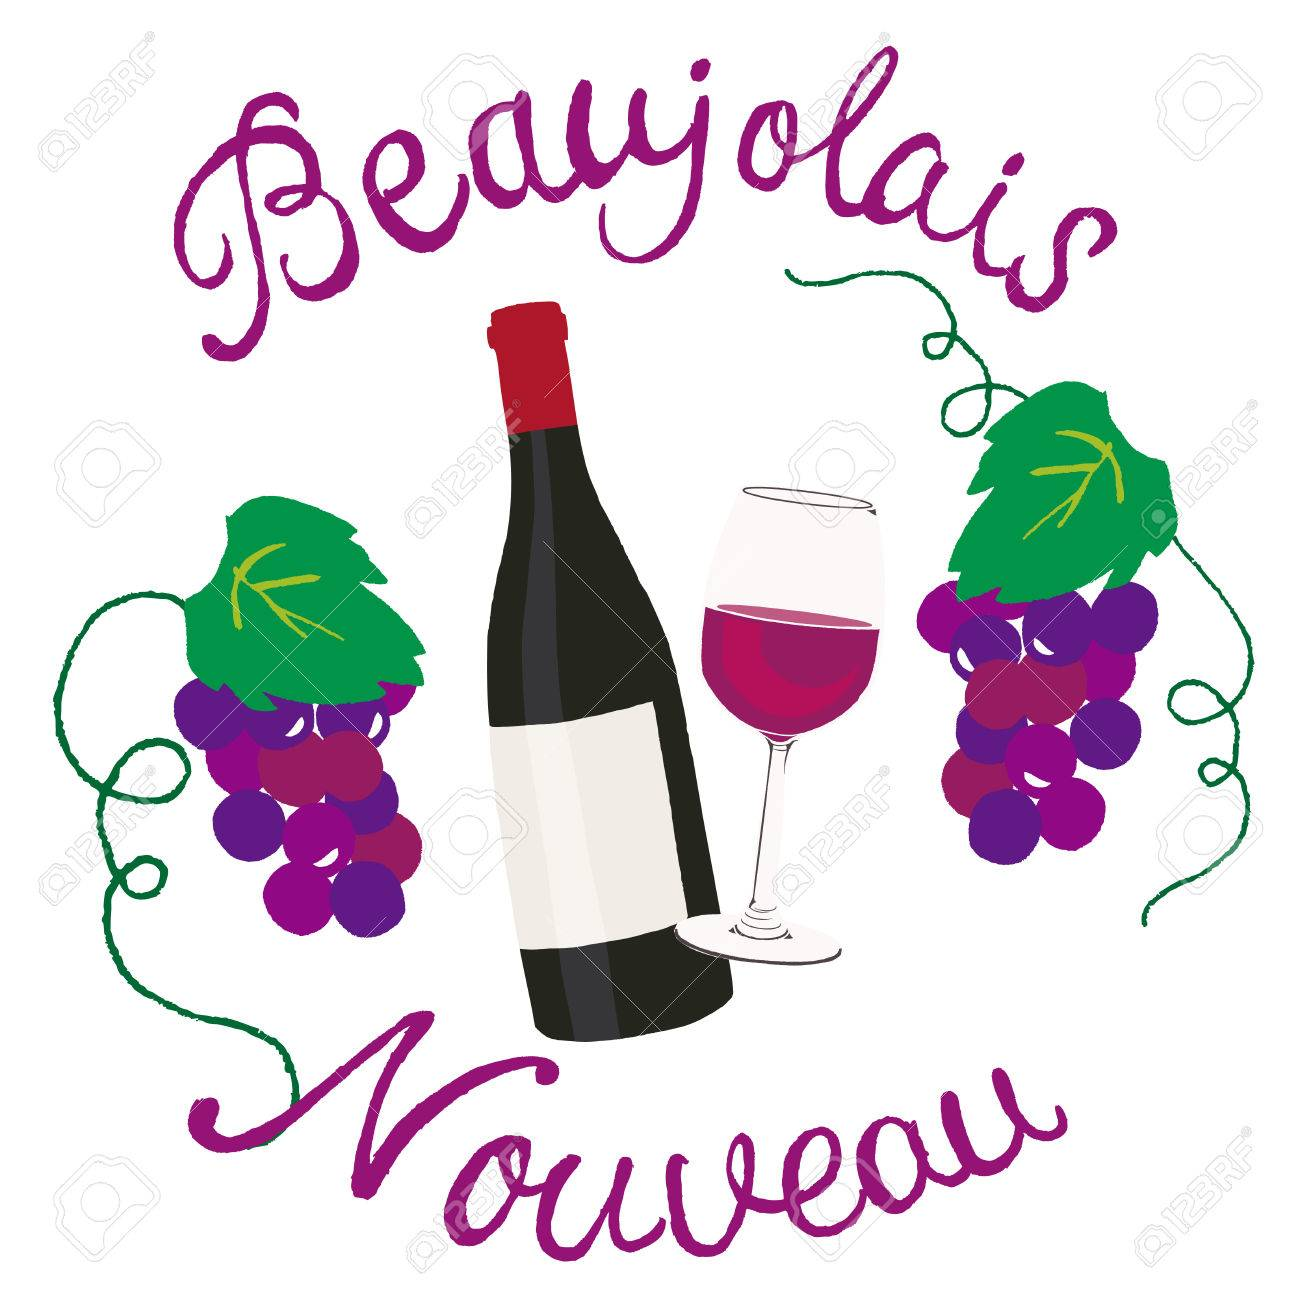 beaujolais nouveau - 63386692